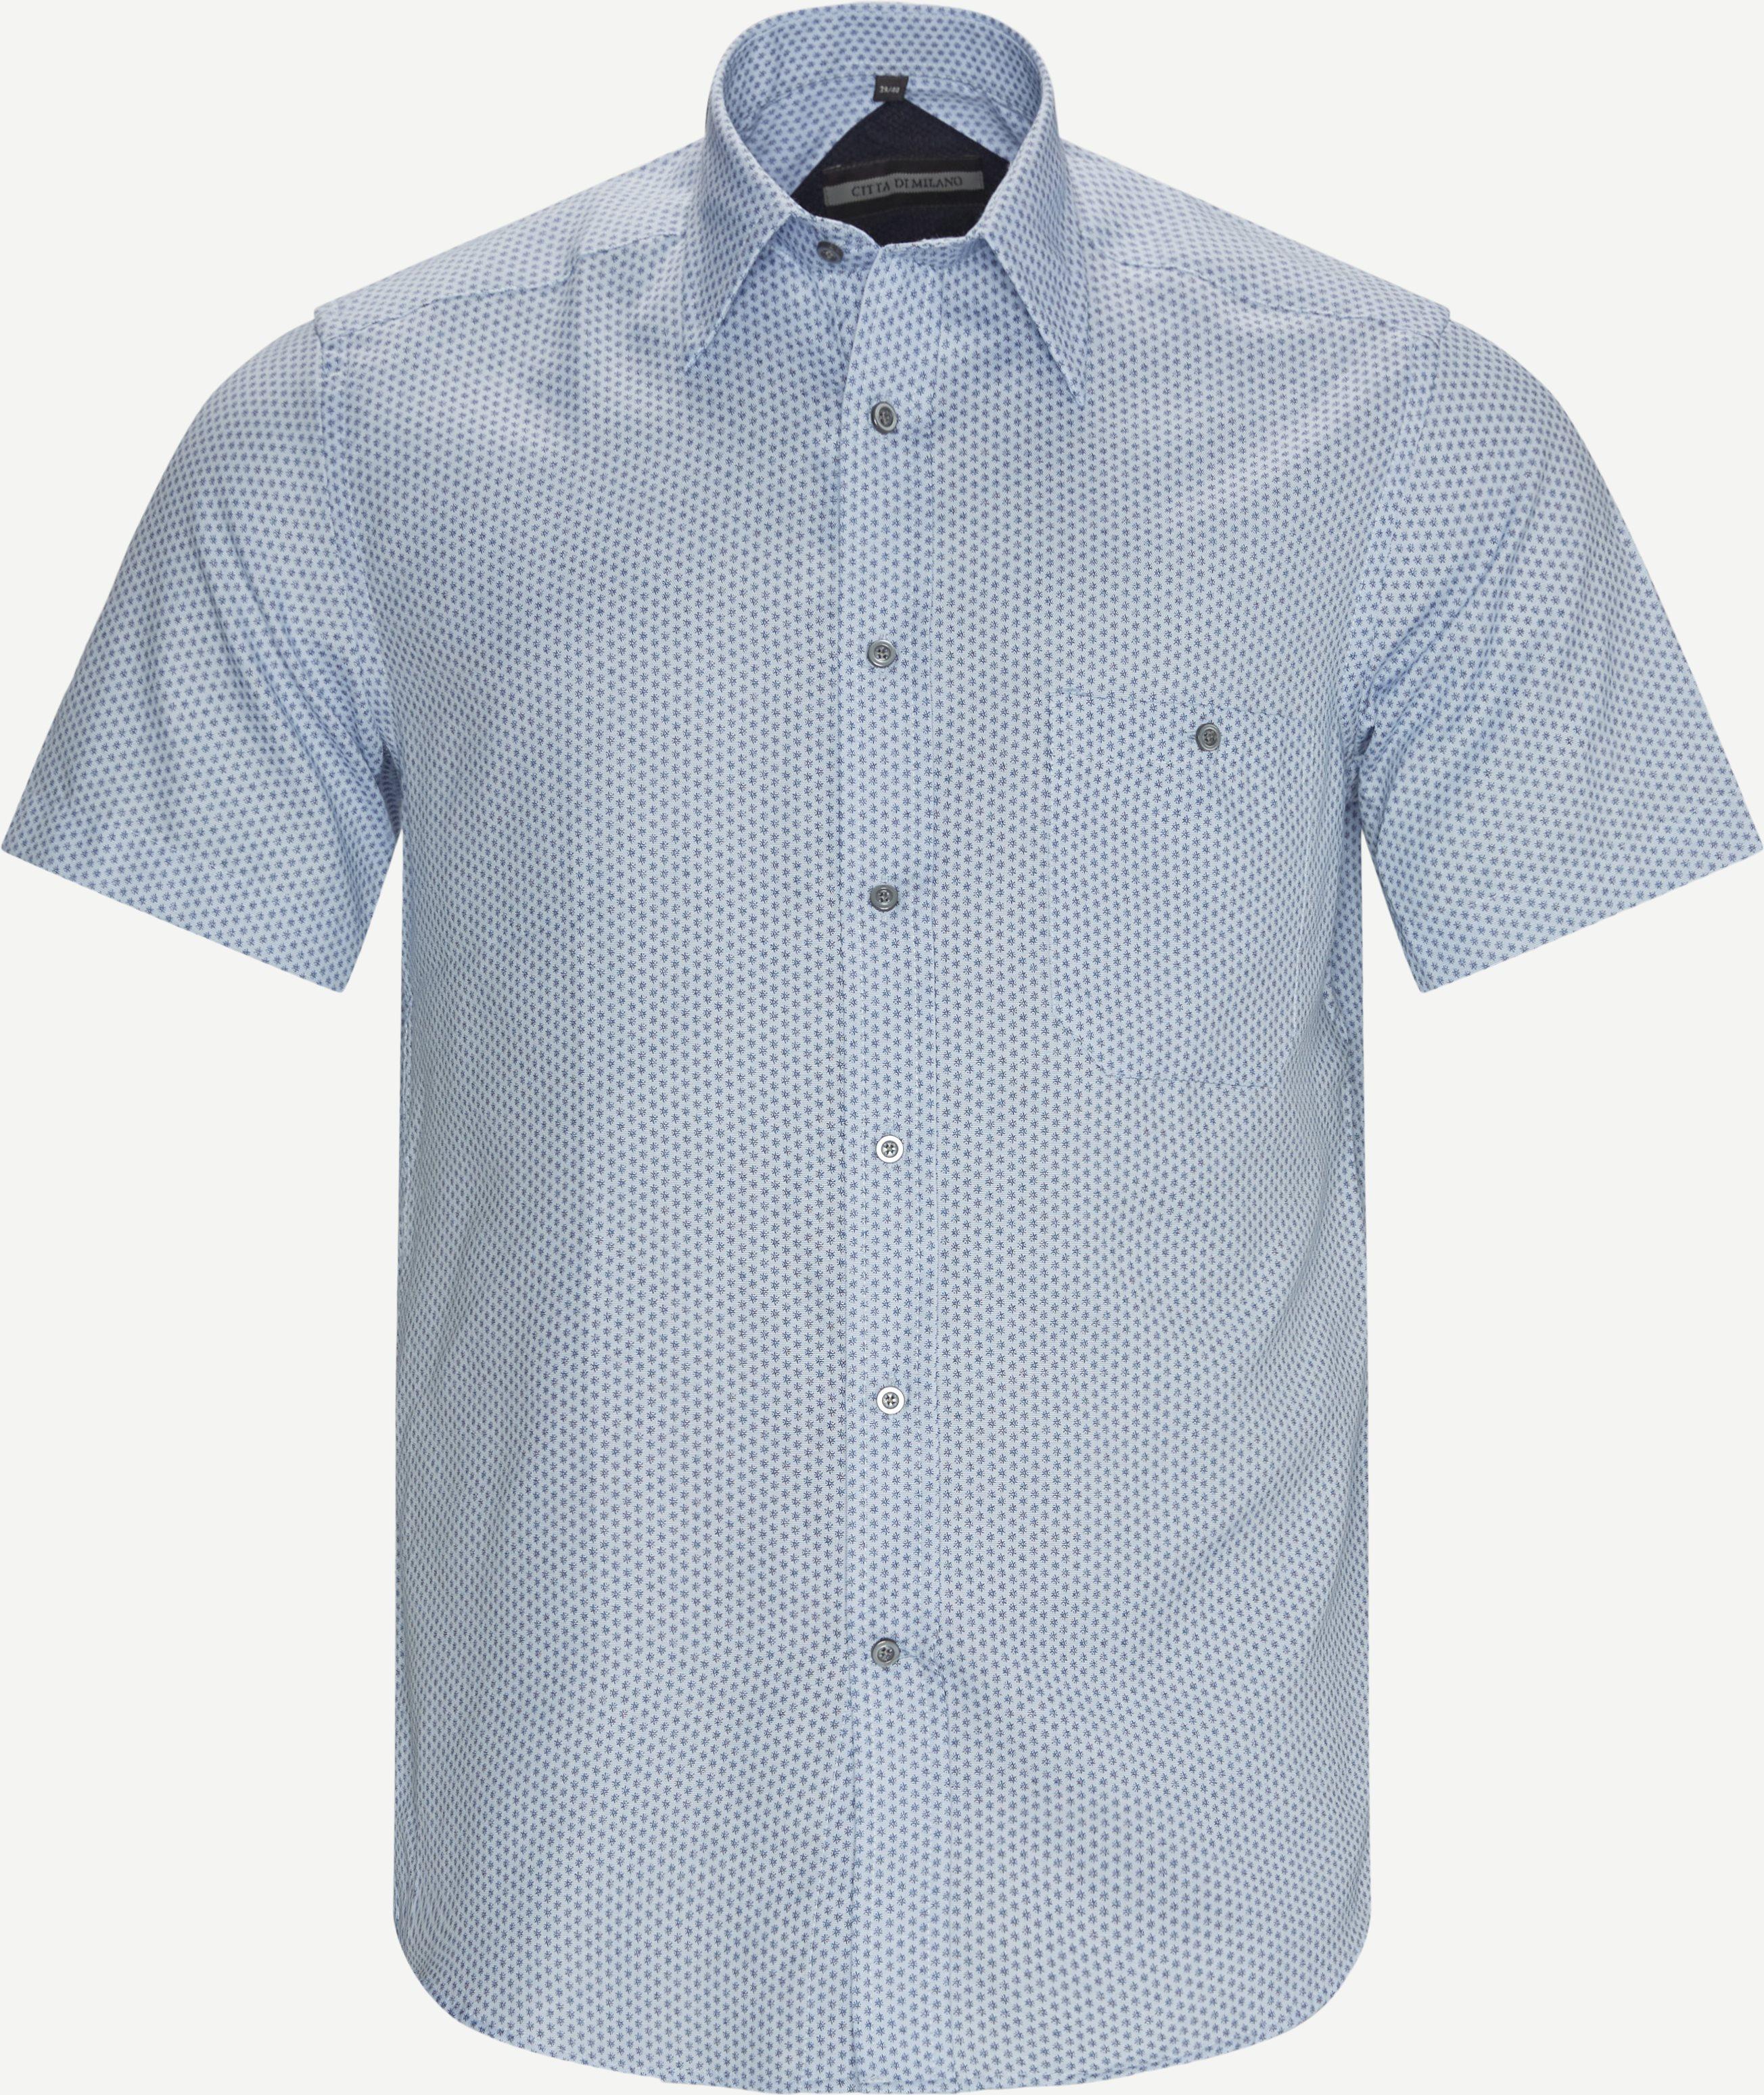 Tavern K/Æ Skjorte - Short-sleeved shirts - Regular fit - Blue